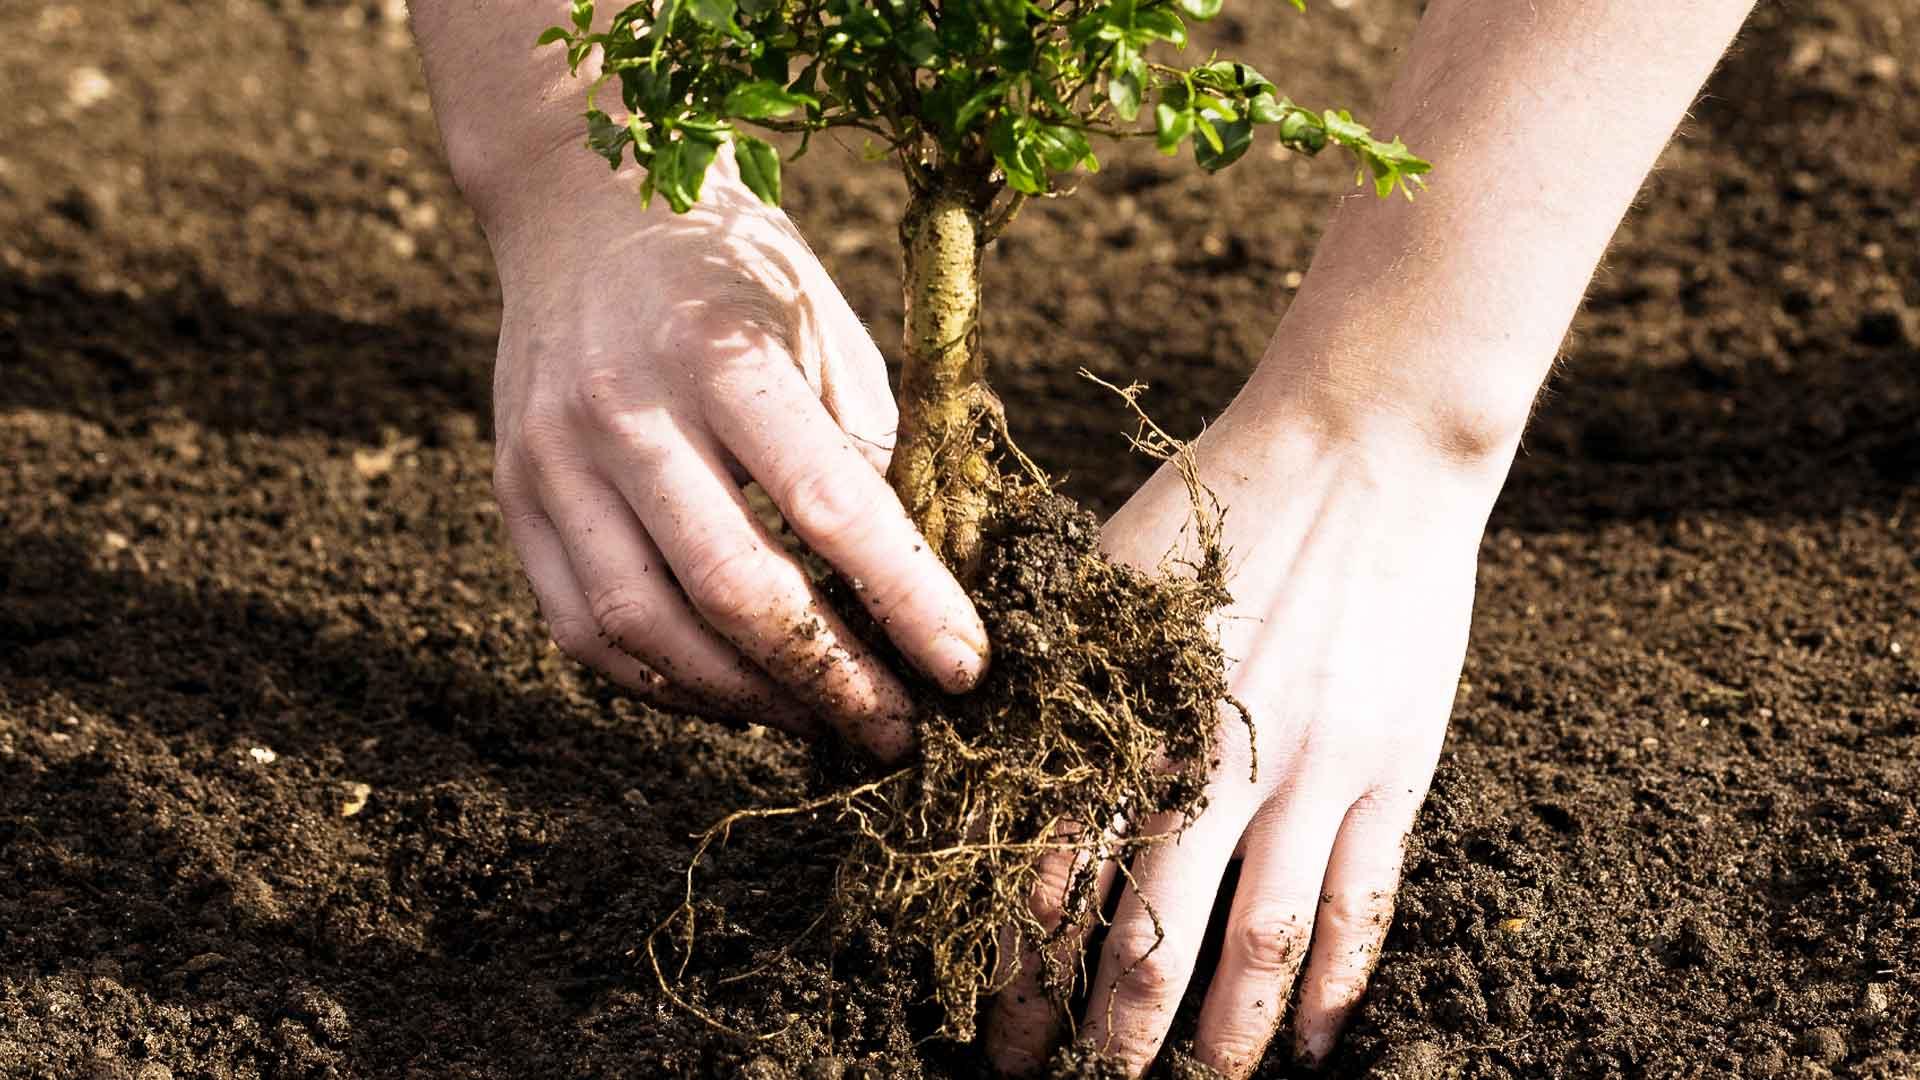 Картинки о посадке деревьев